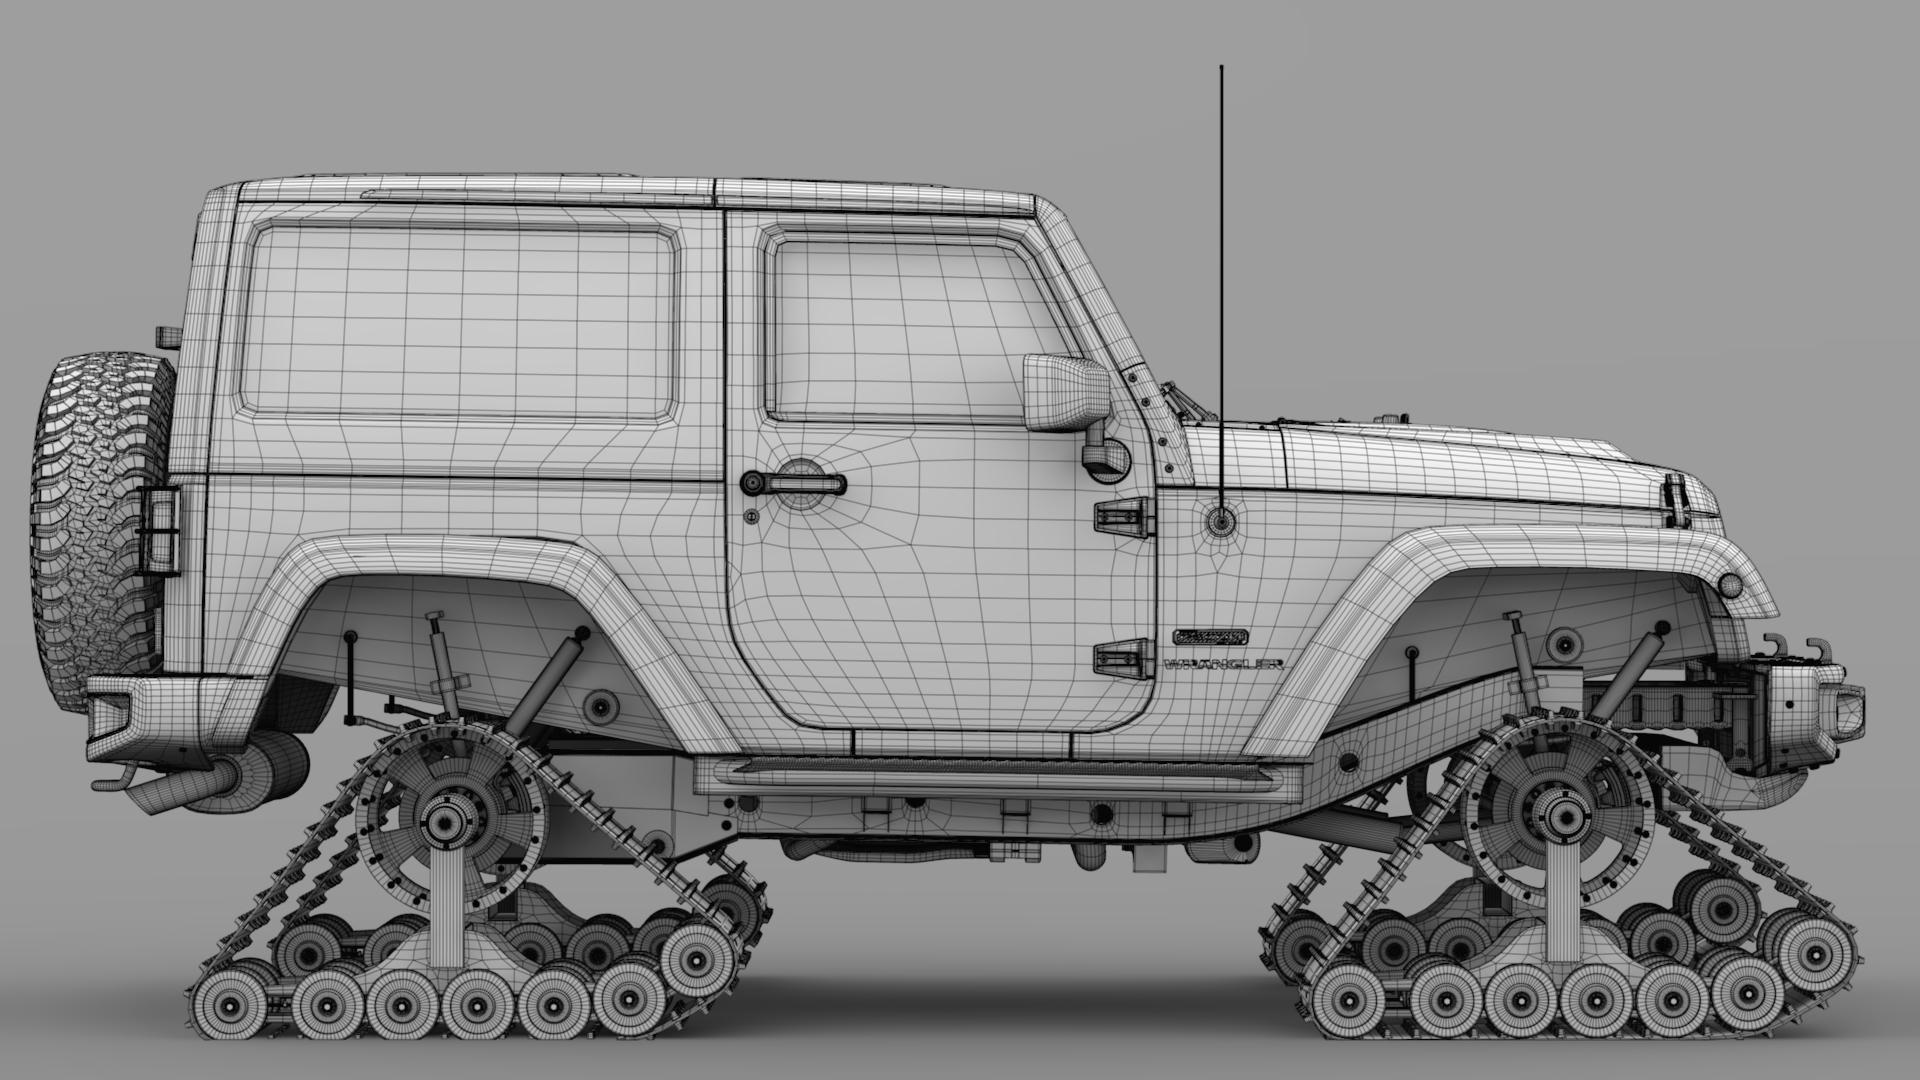 jeep wrangler crawler rubicon recon jk 2017 3d model max fbx c4d lwo ma mb hrc xsi obj 276921